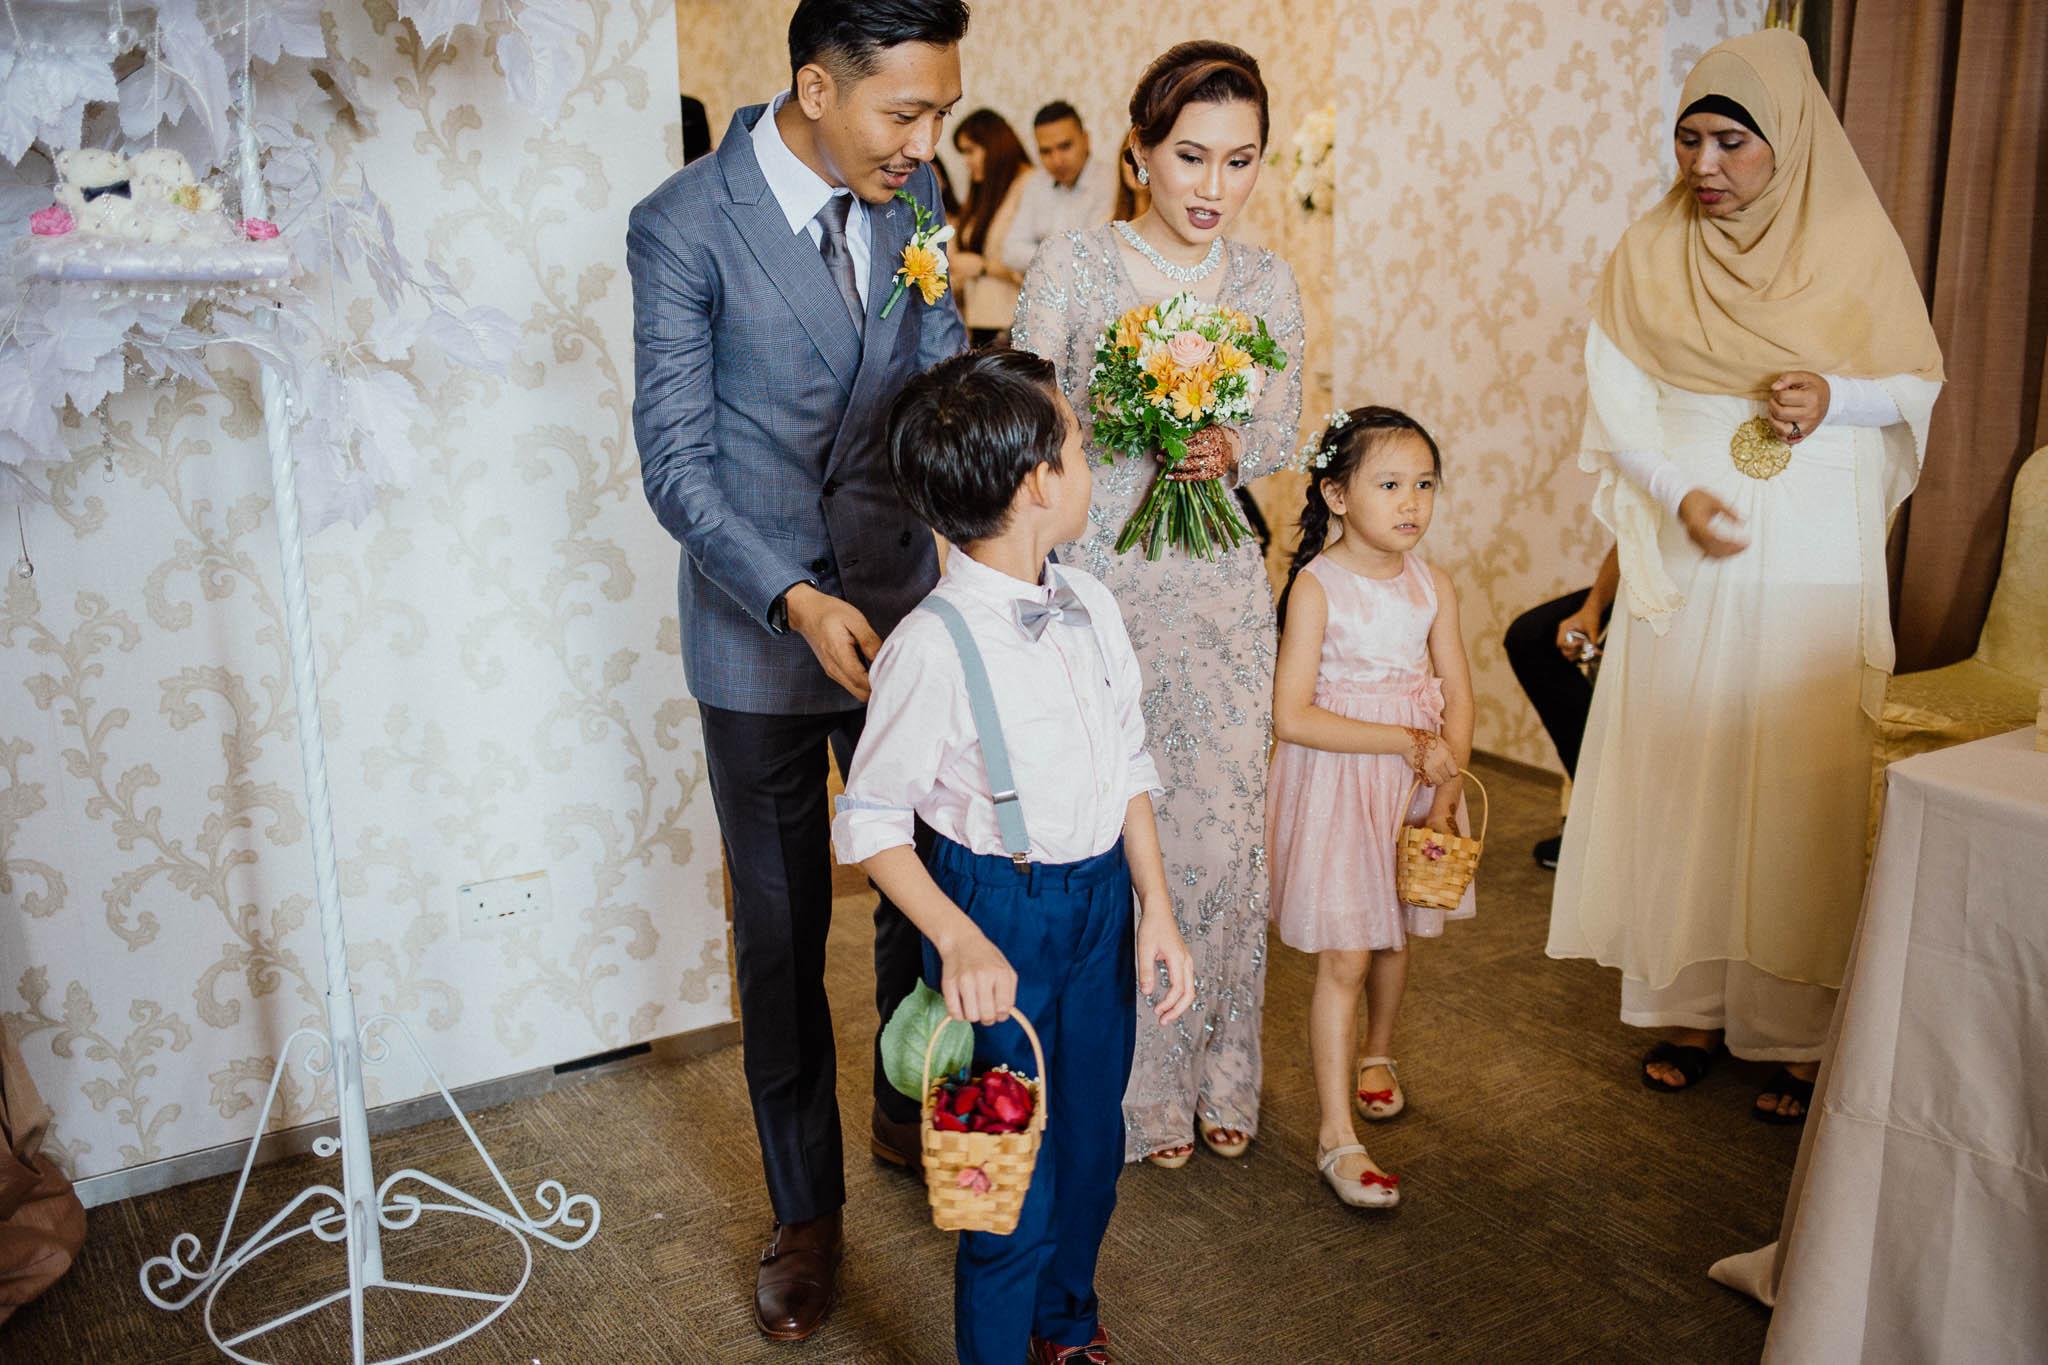 singapore-wedding-photographer-wedding-nufail-addafiq-044.jpg